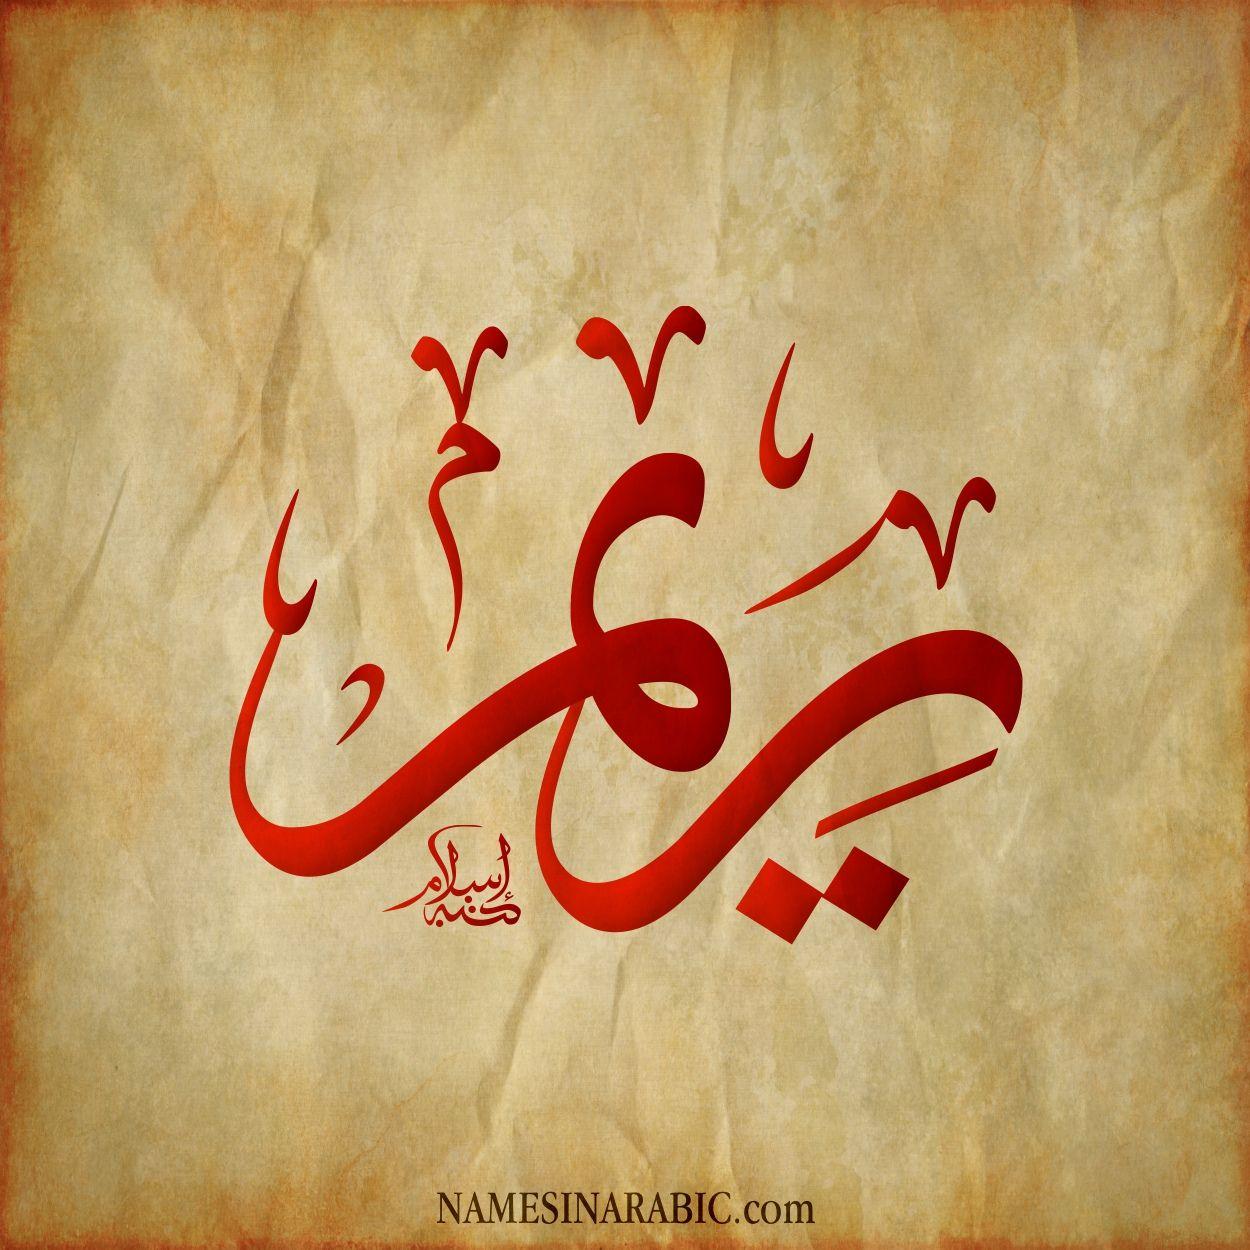 Pin By Samira On Prenoms Calligraphie Arabe Islamic Art Calligraphy Calligraphy Name Name Design Art